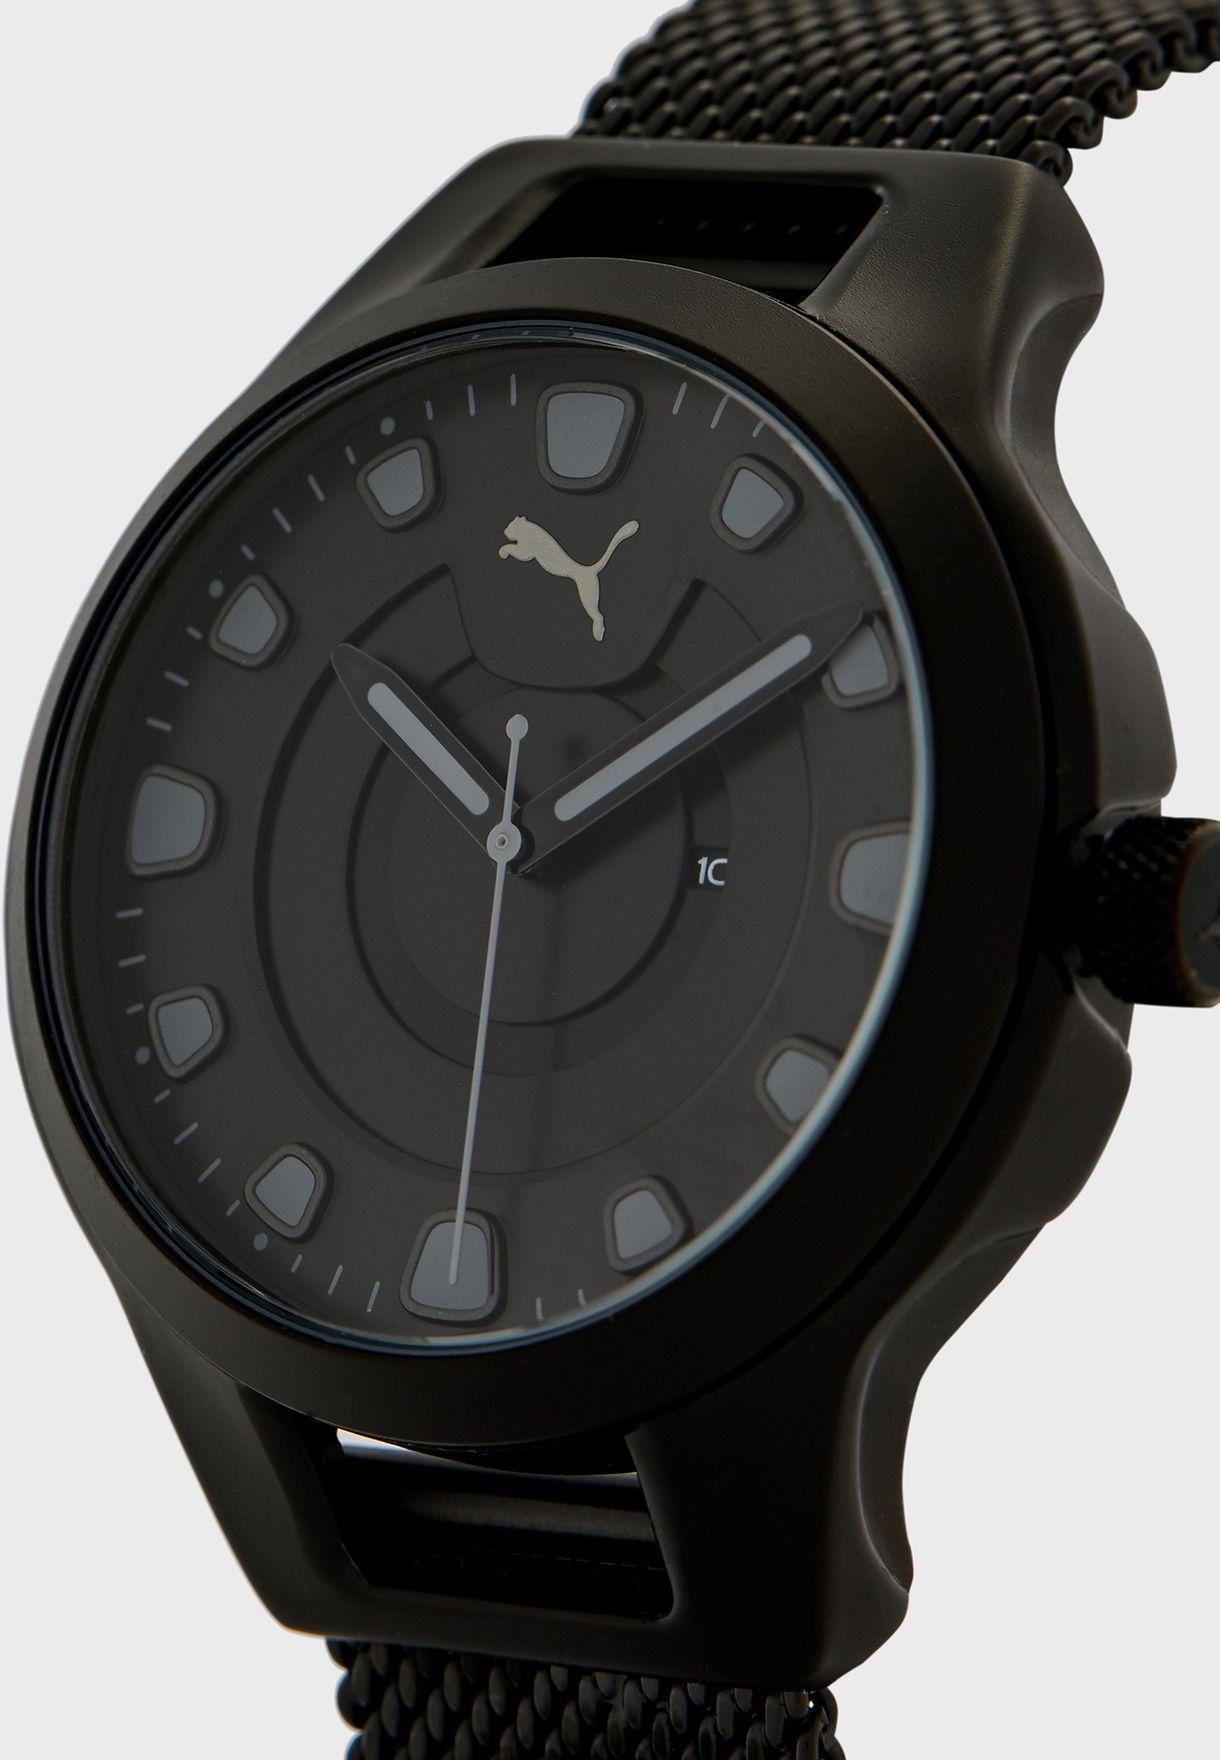 Reset Analog Watch